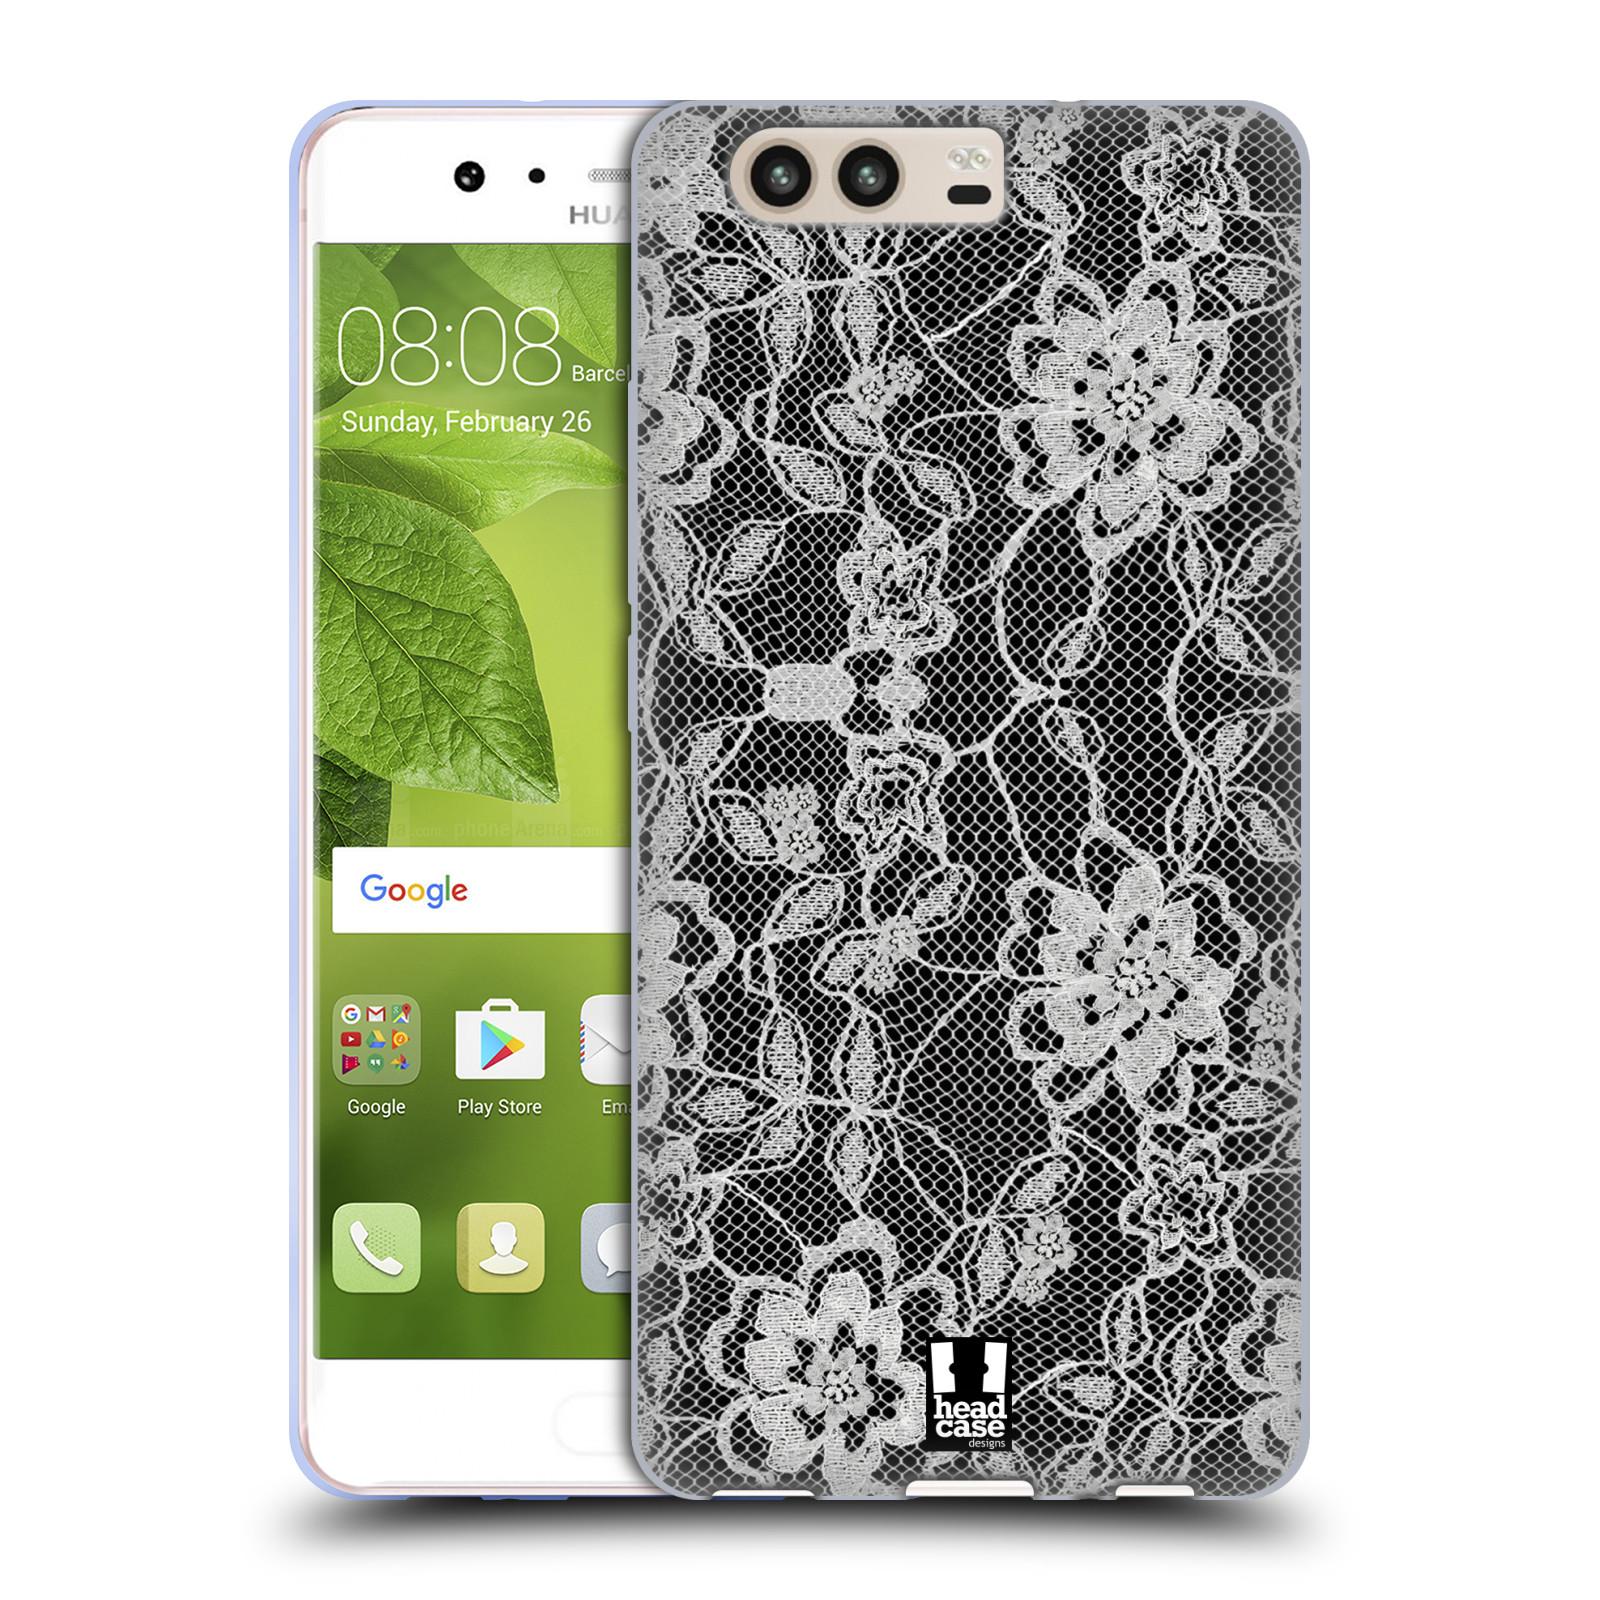 Silikonové pouzdro na mobil Huawei P10 - Head Case - FLOWERY KRAJKA (Silikonový kryt či obal na mobilní telefon Huawei P10)